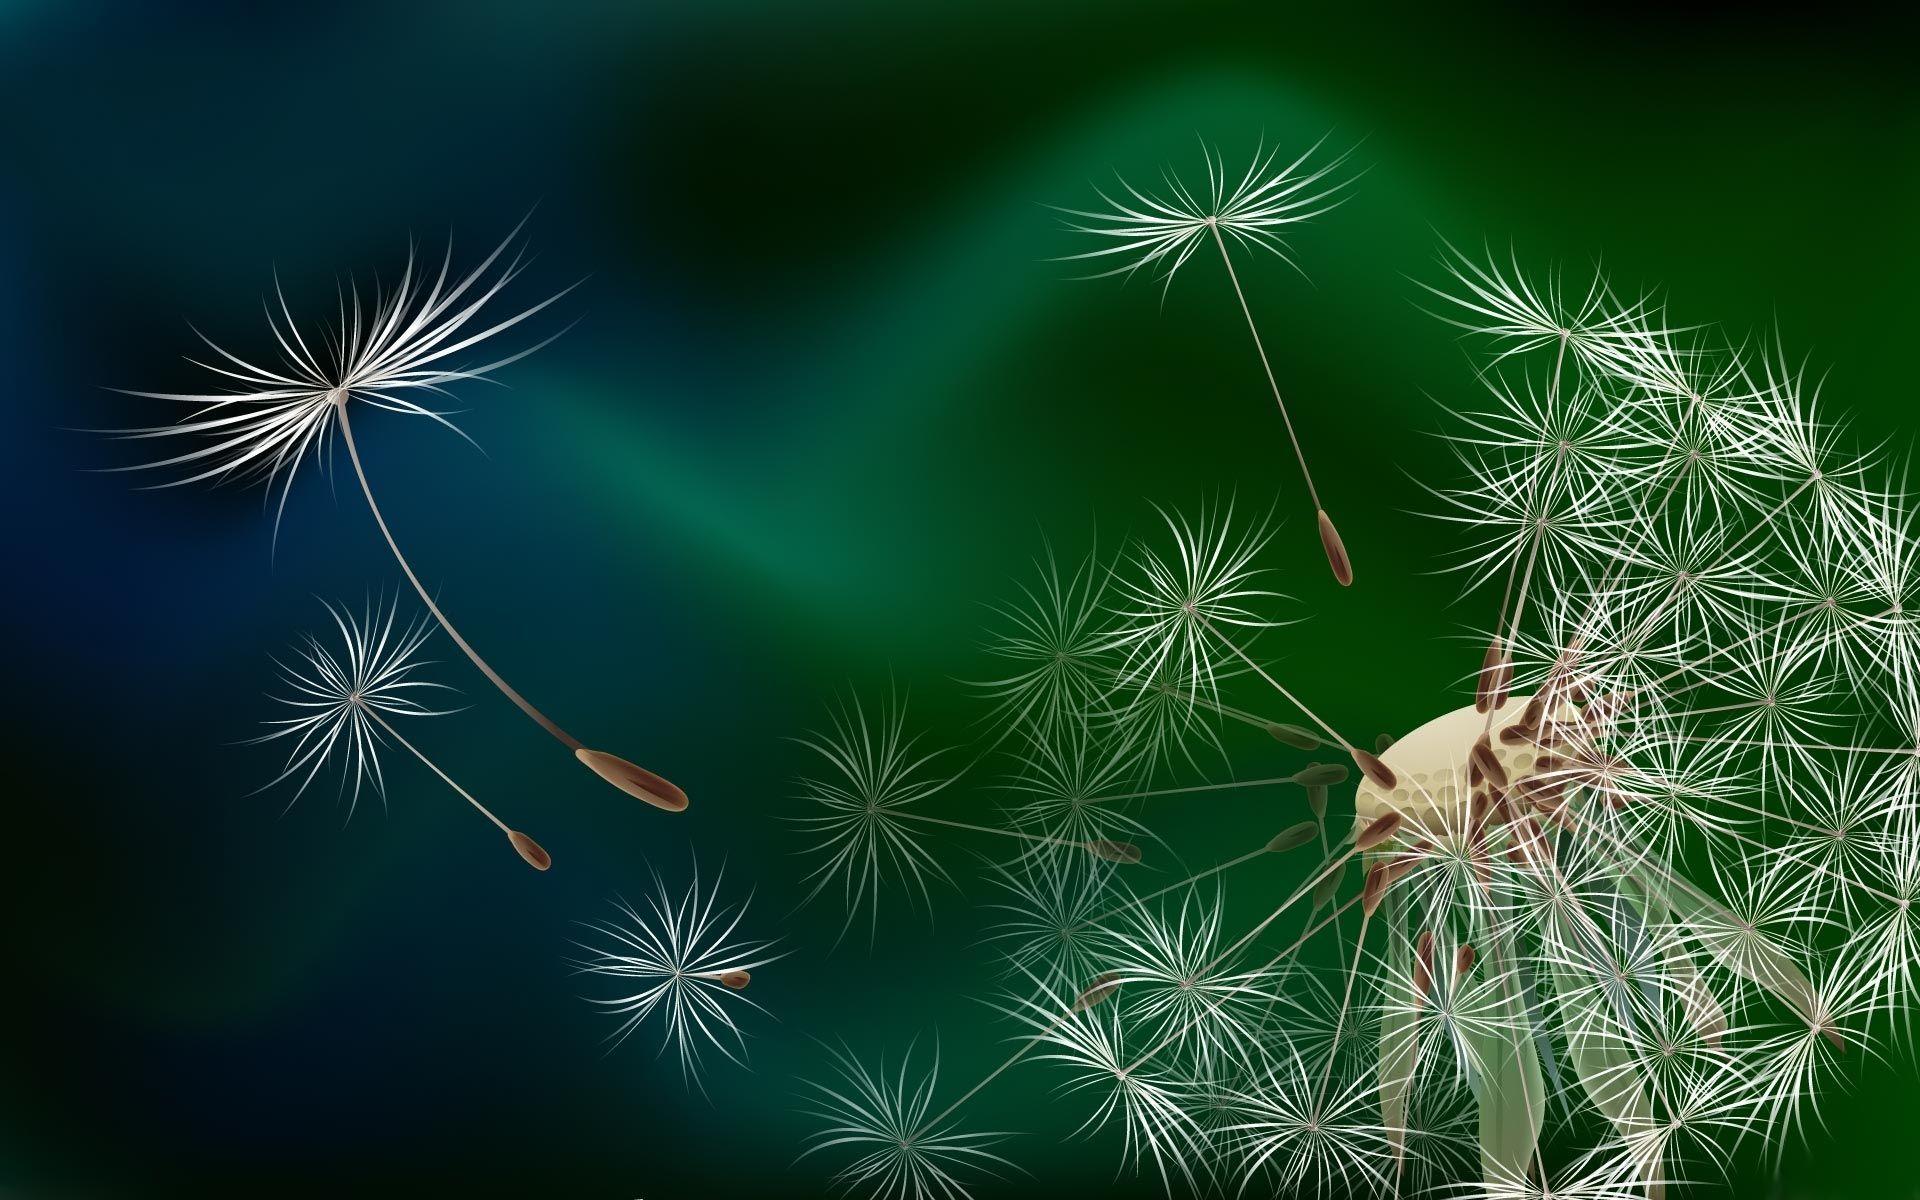 Image result for dandelion head seeding the world